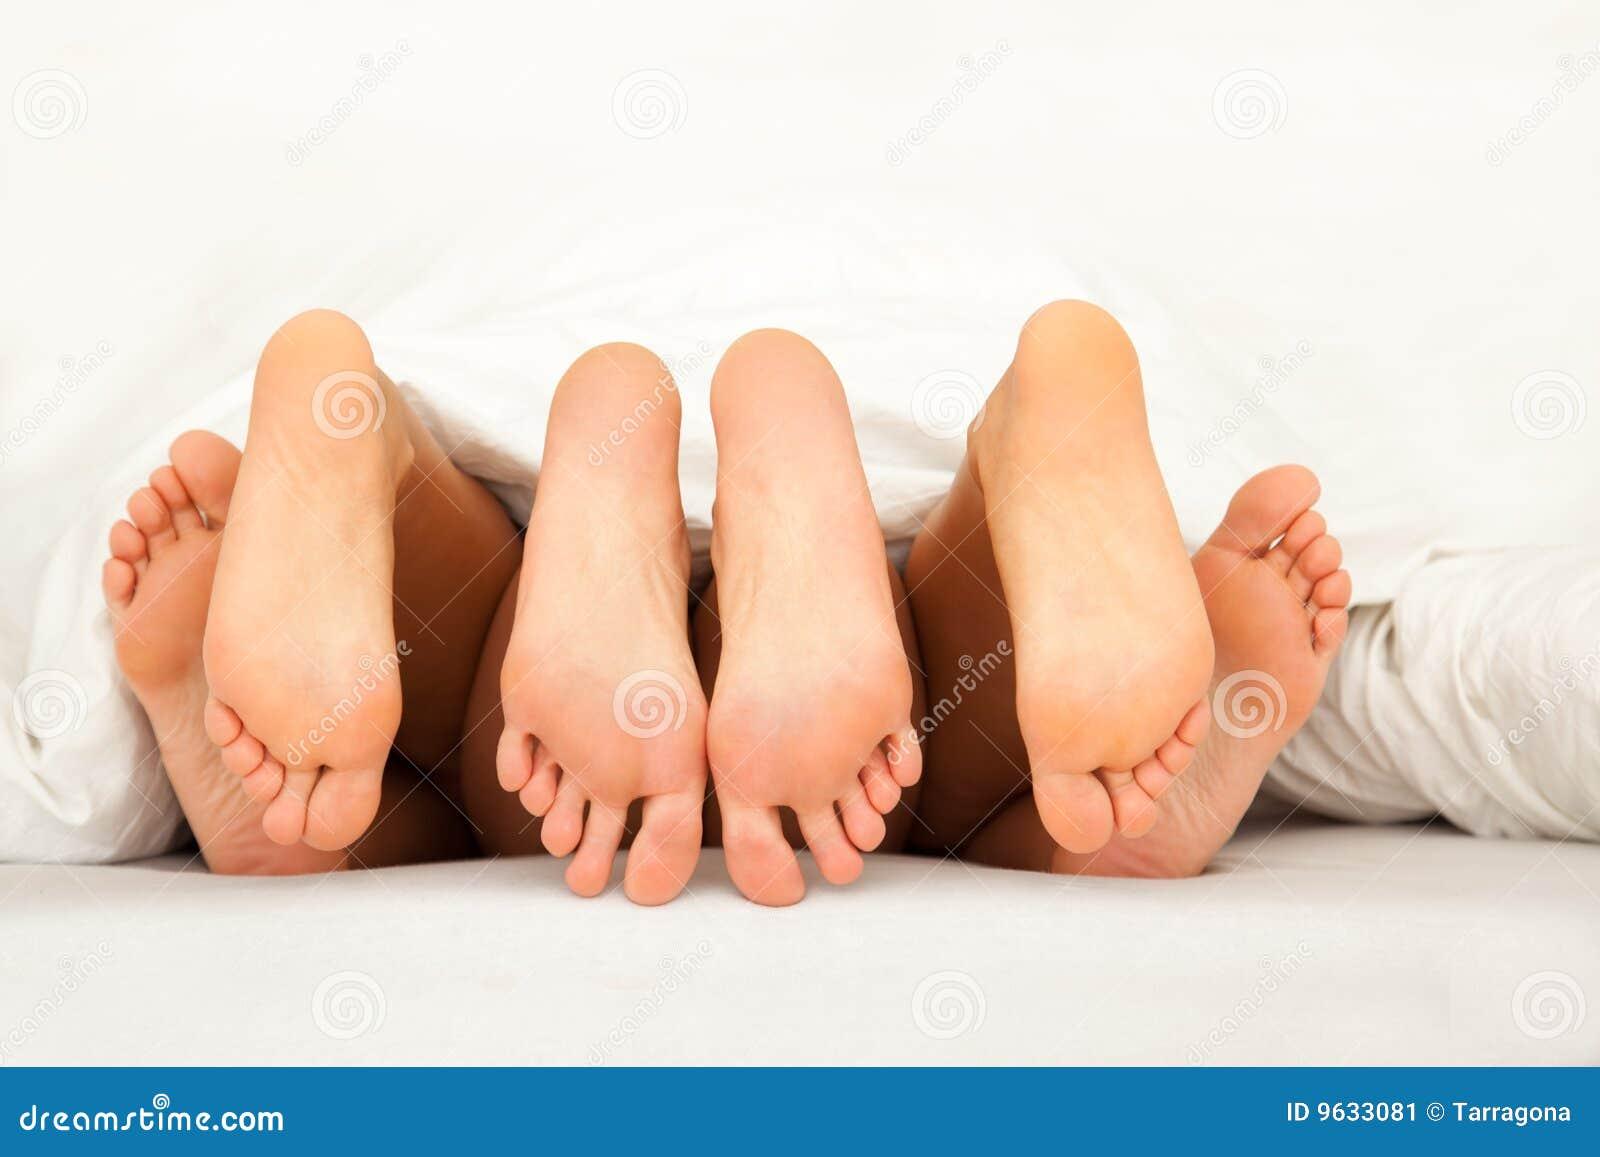 Having Sex When Someone Is Sleeping